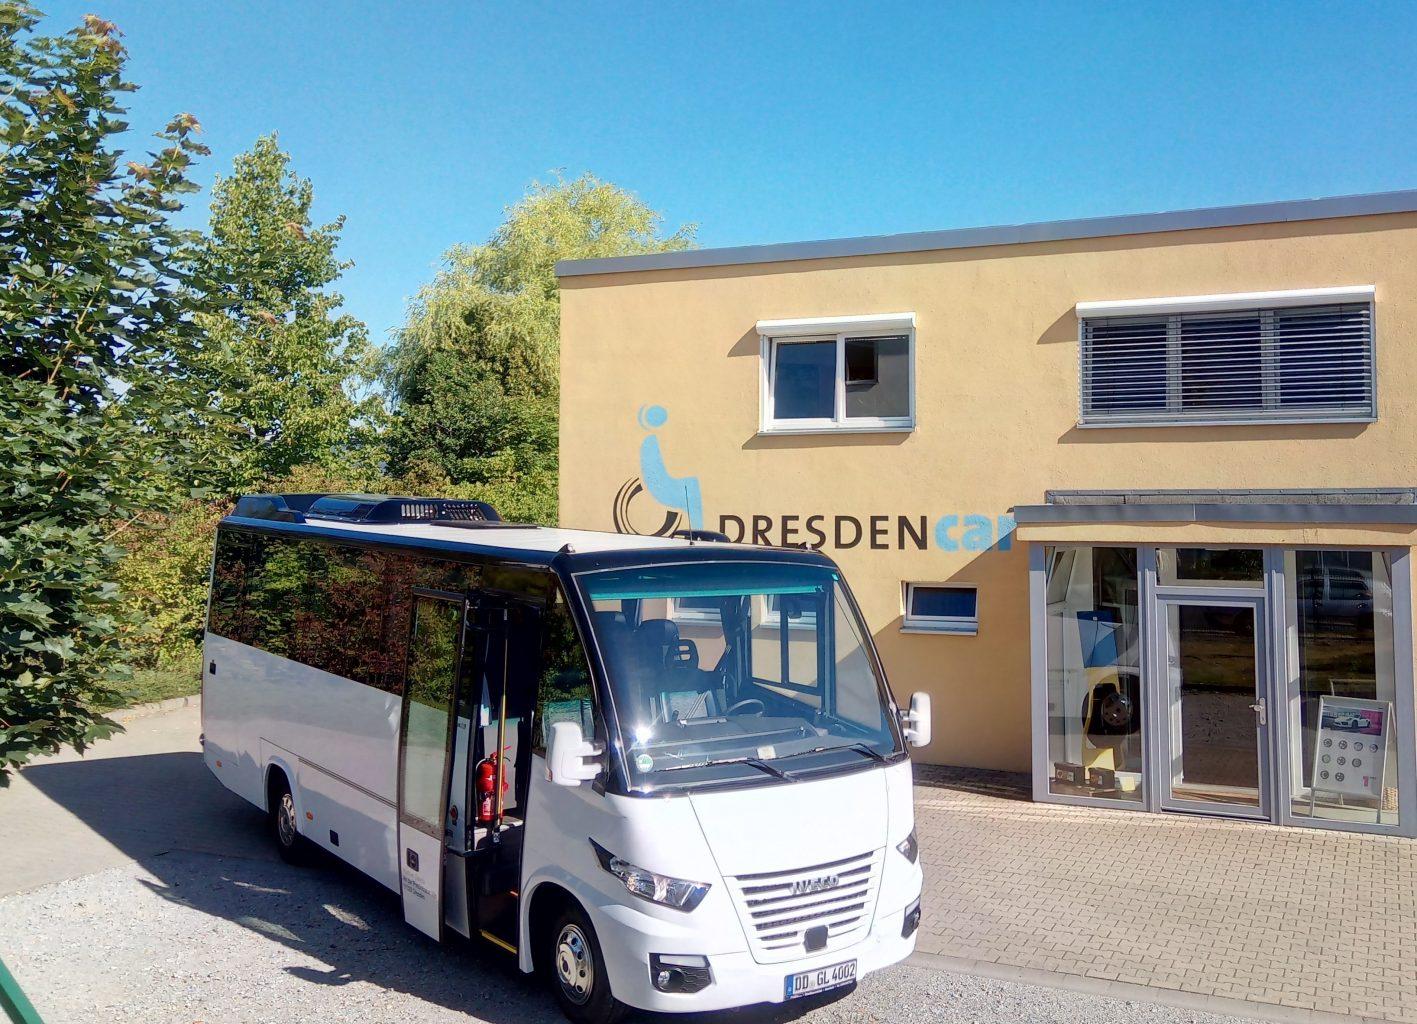 Bus Dresdencar